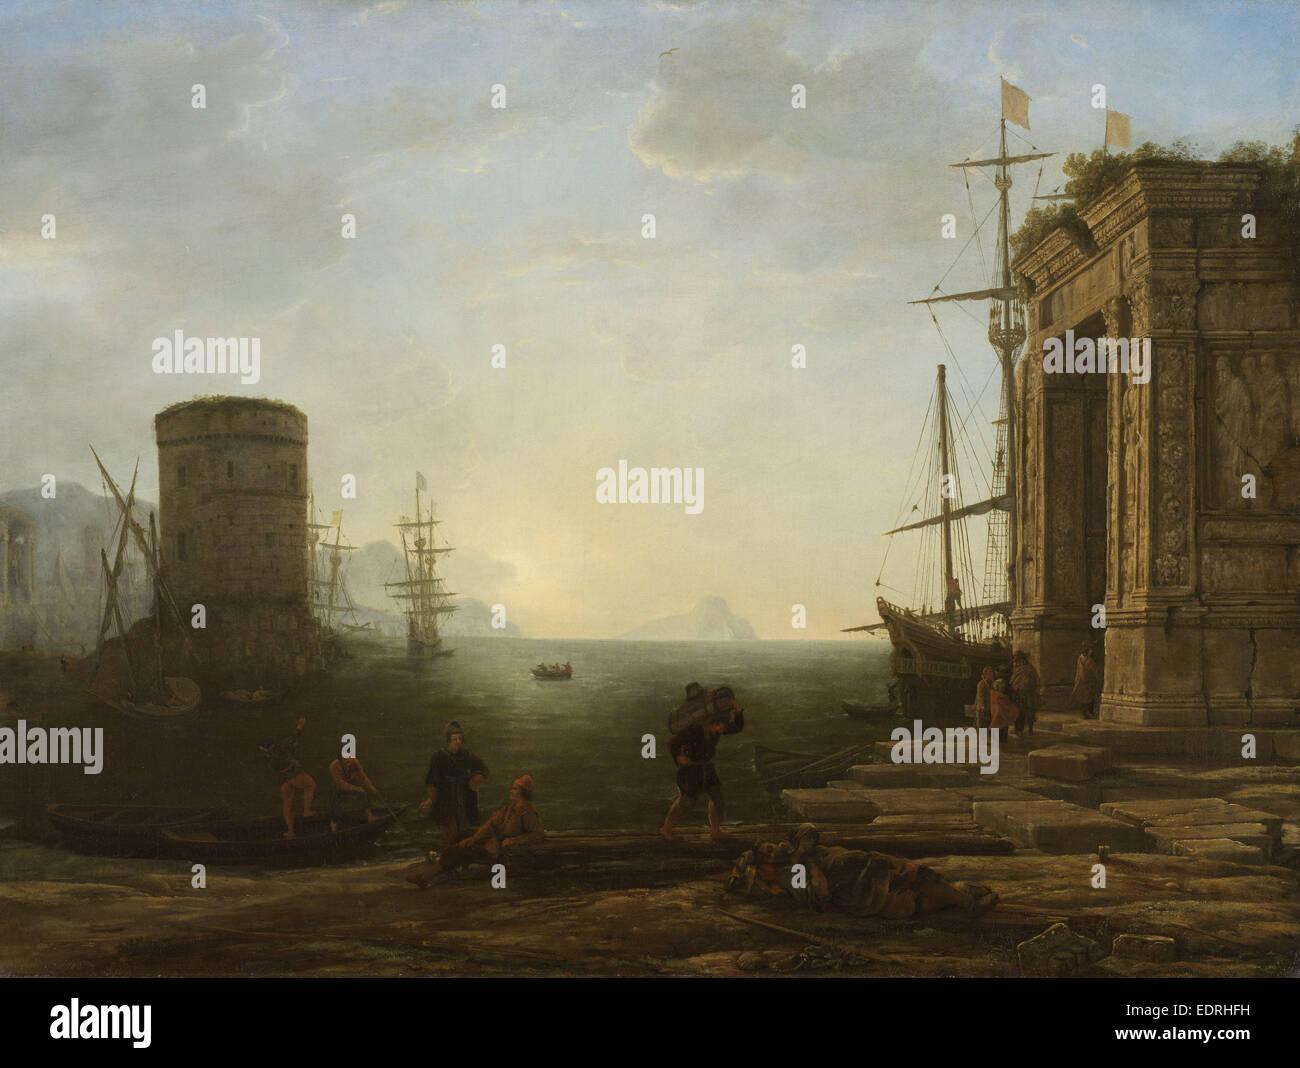 Harbour at Sunrise, Gellée,  Le Lorrain , Claude, c. 1637 - c. 1638 - Stock Image